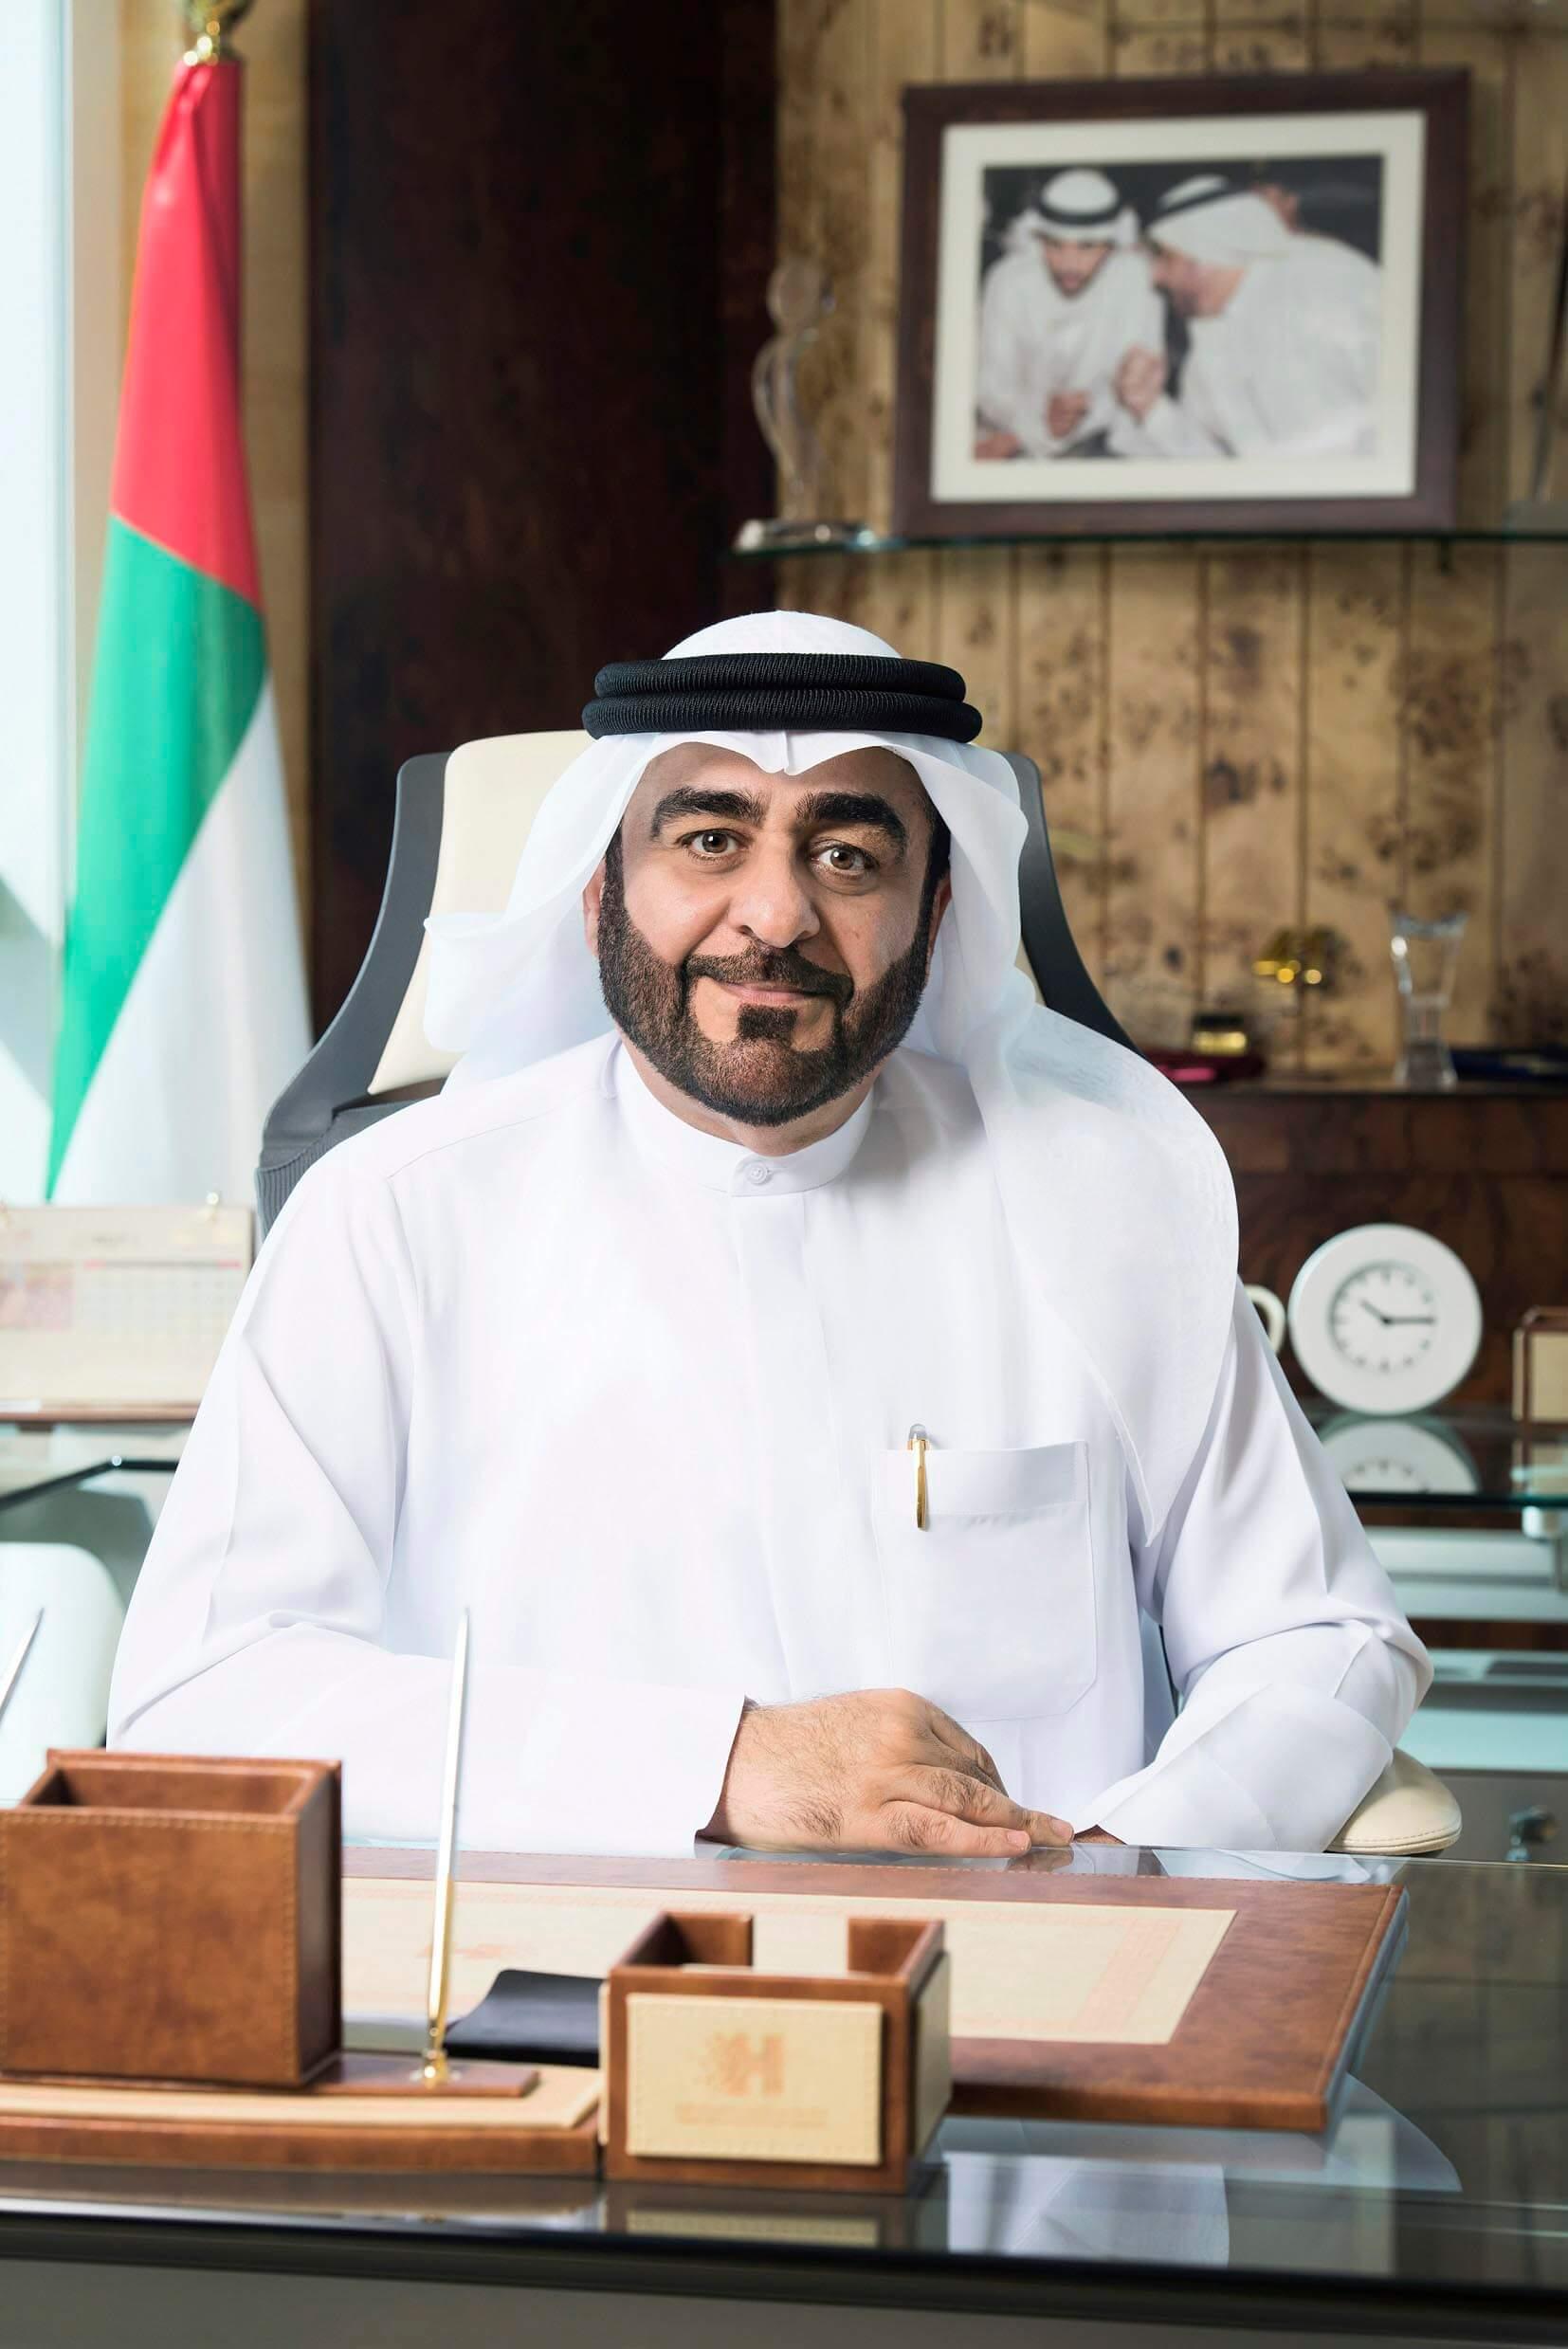 Dr. Mansoor Al Awar, Chancellor of HBMSU